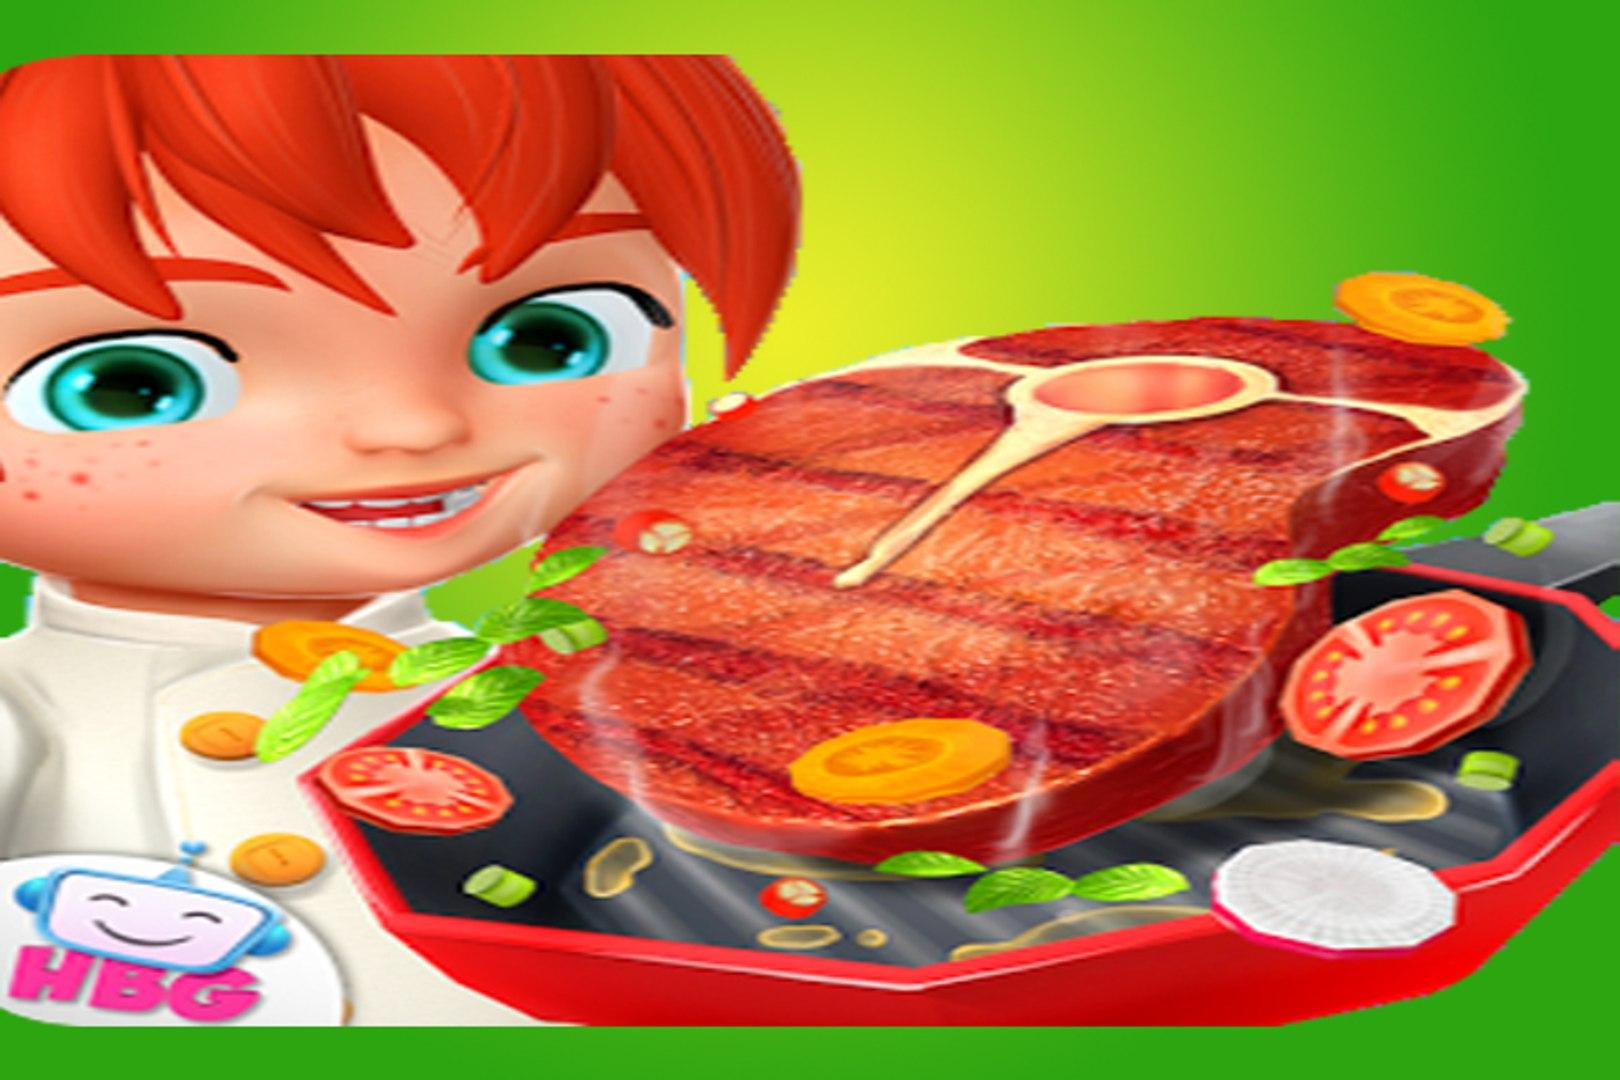 Kids Cartoons adventure - education for childrens - Crazy Cooking Steak Maker 3D - Video for kids